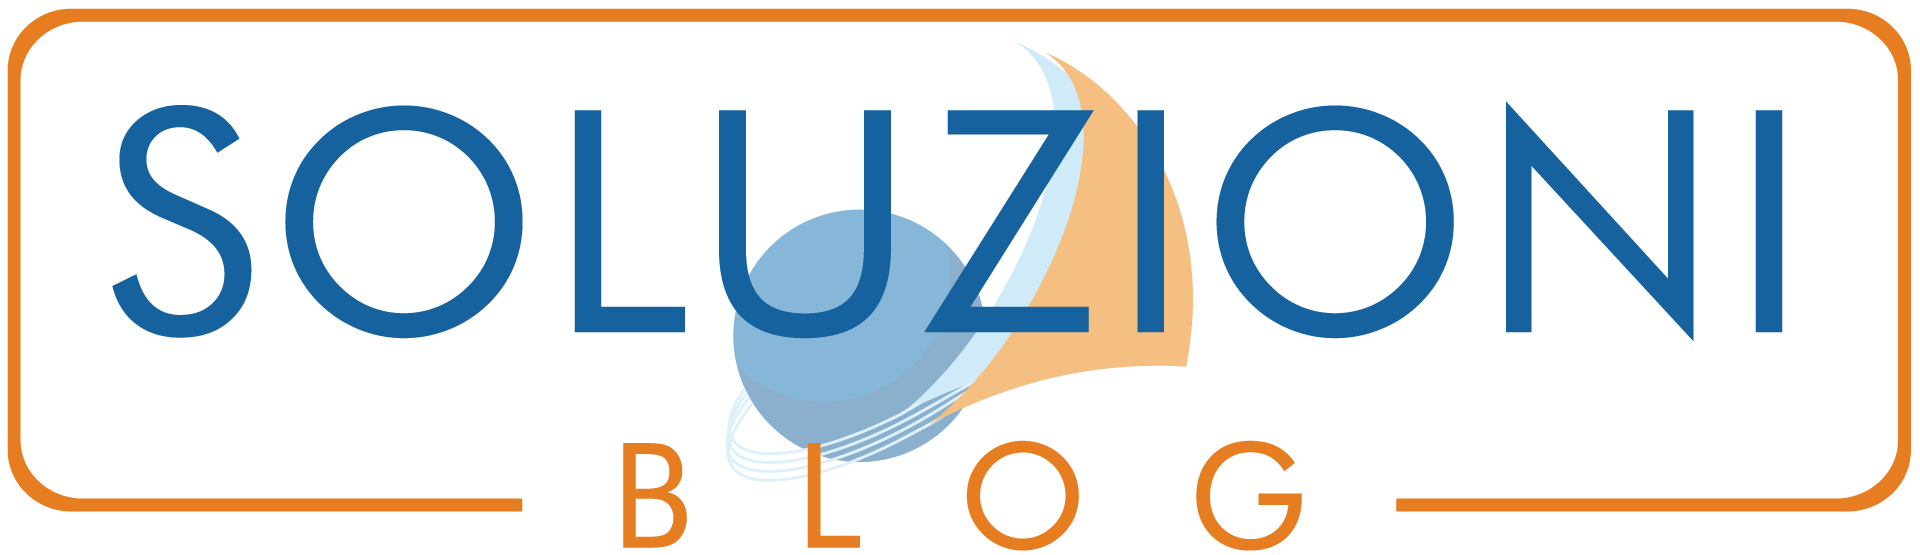 Soluzioni Blog by Geo Network